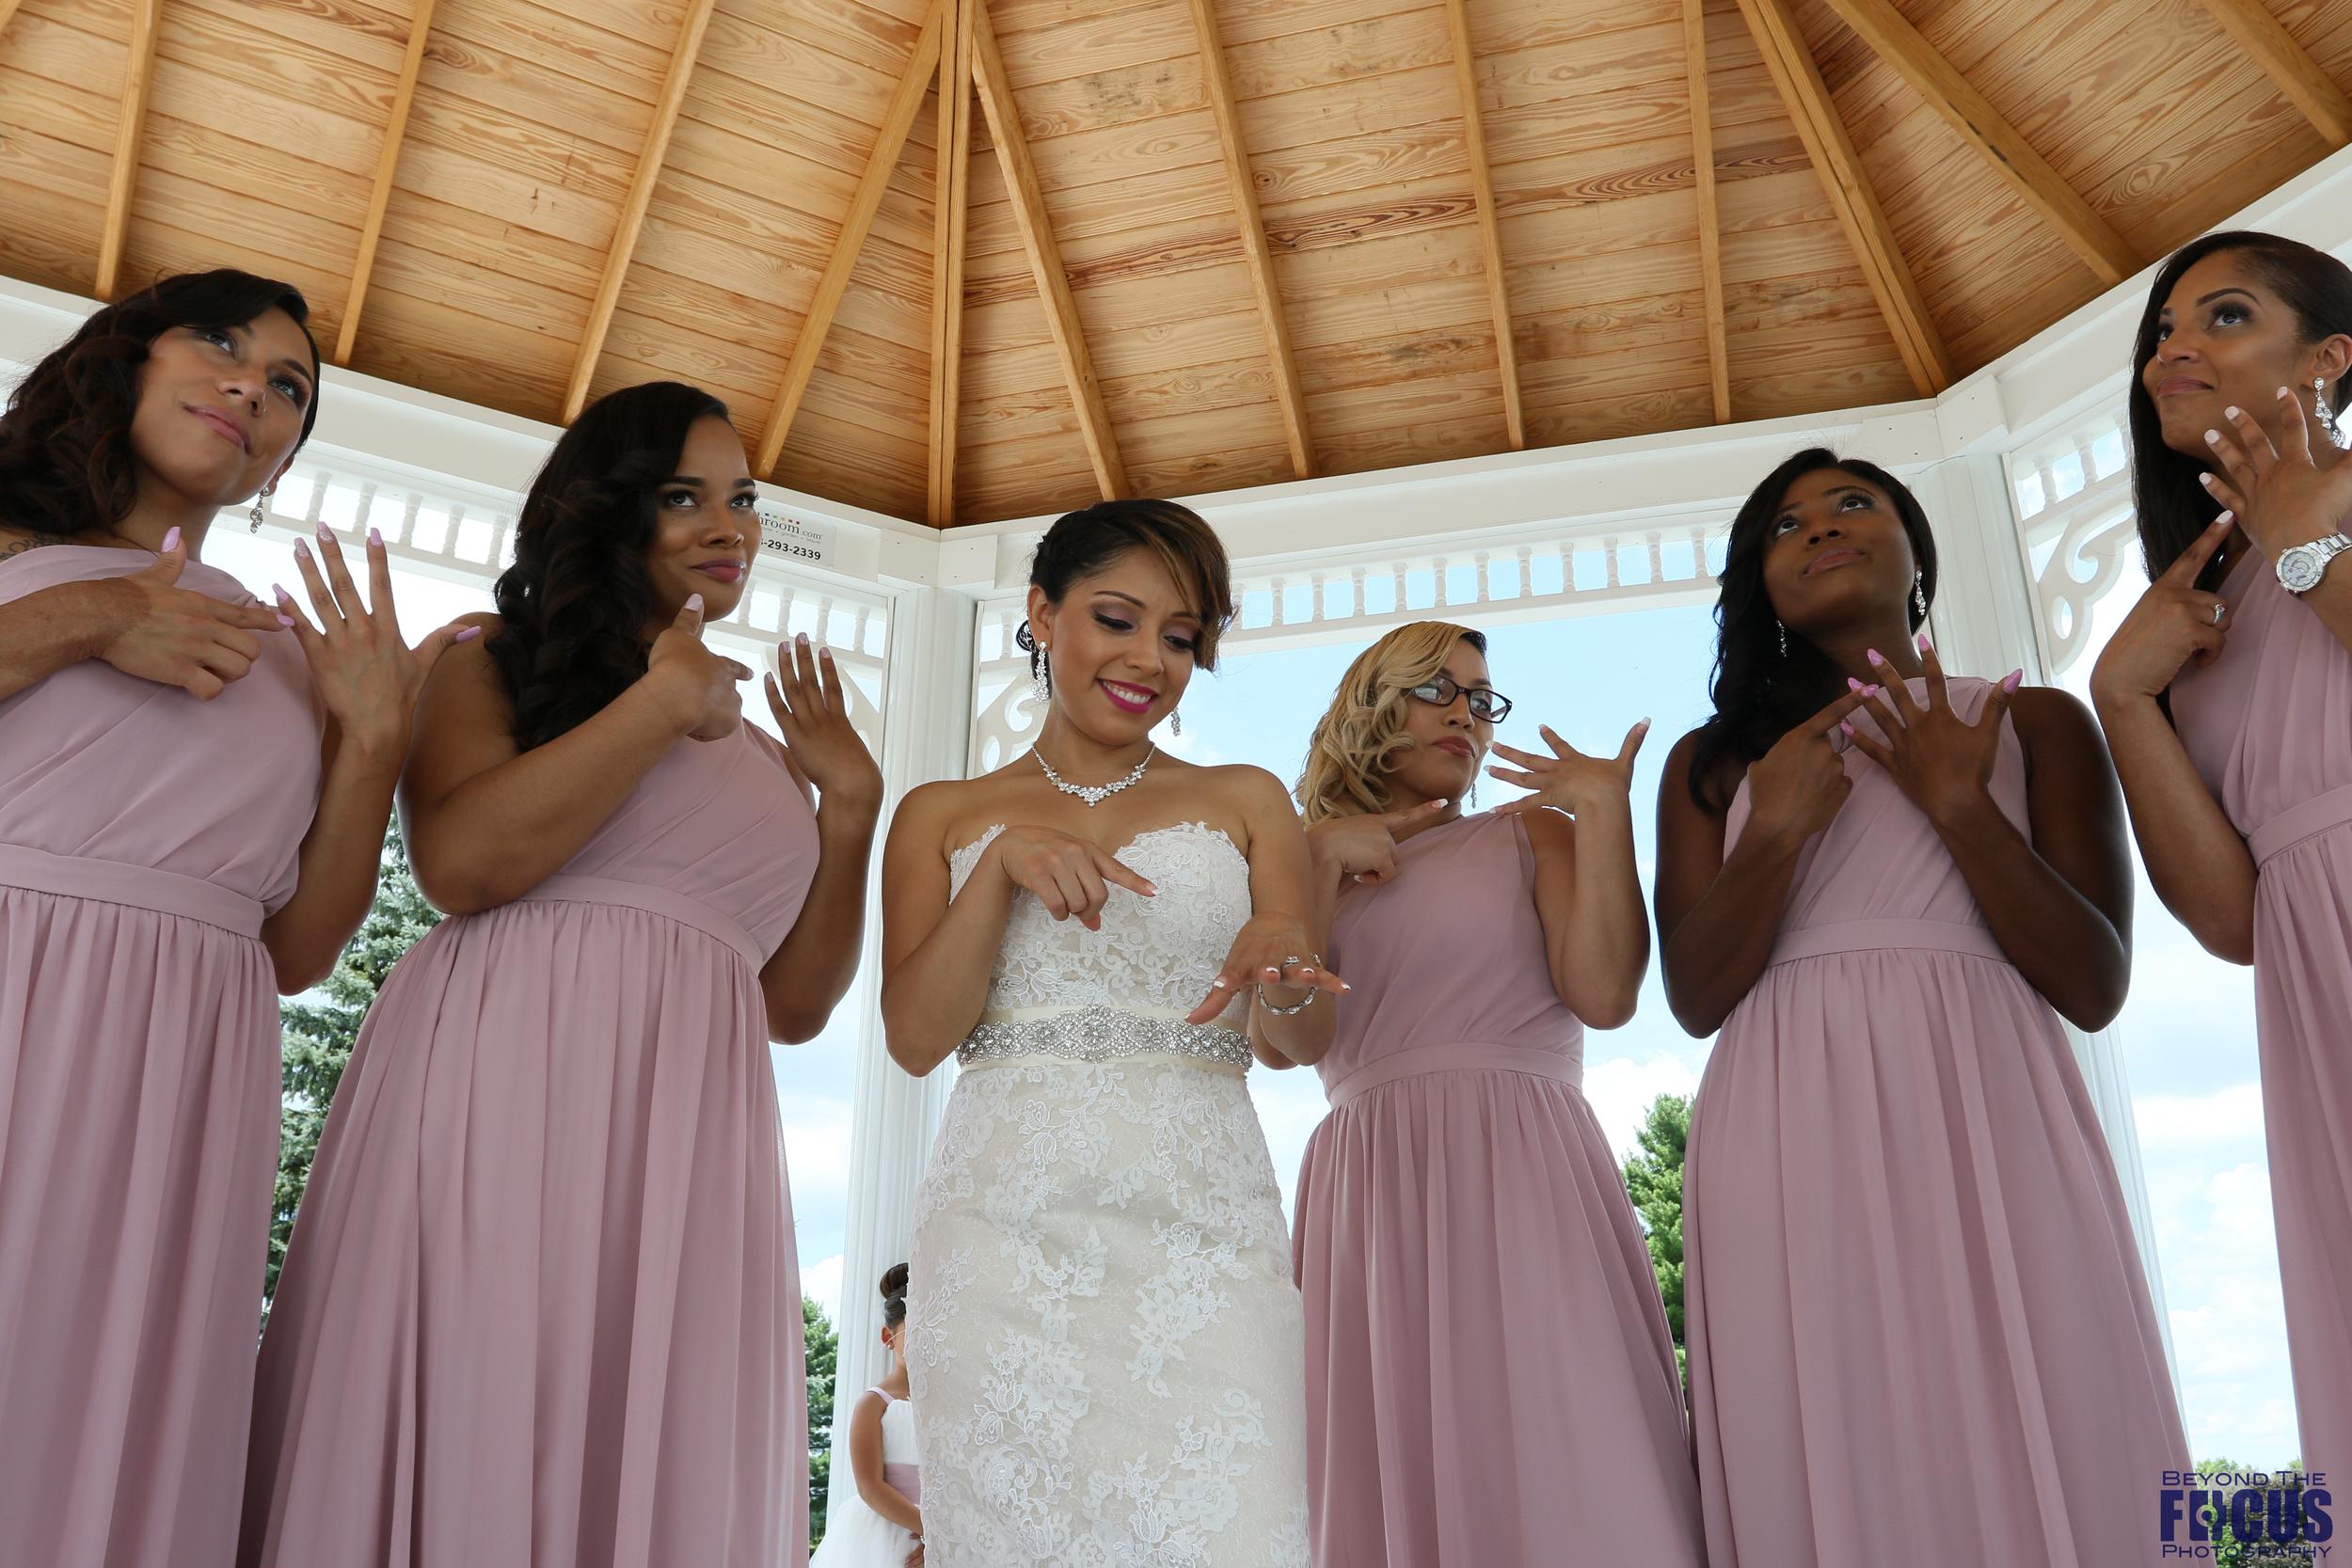 Palmer Wedding - Candids49.jpg